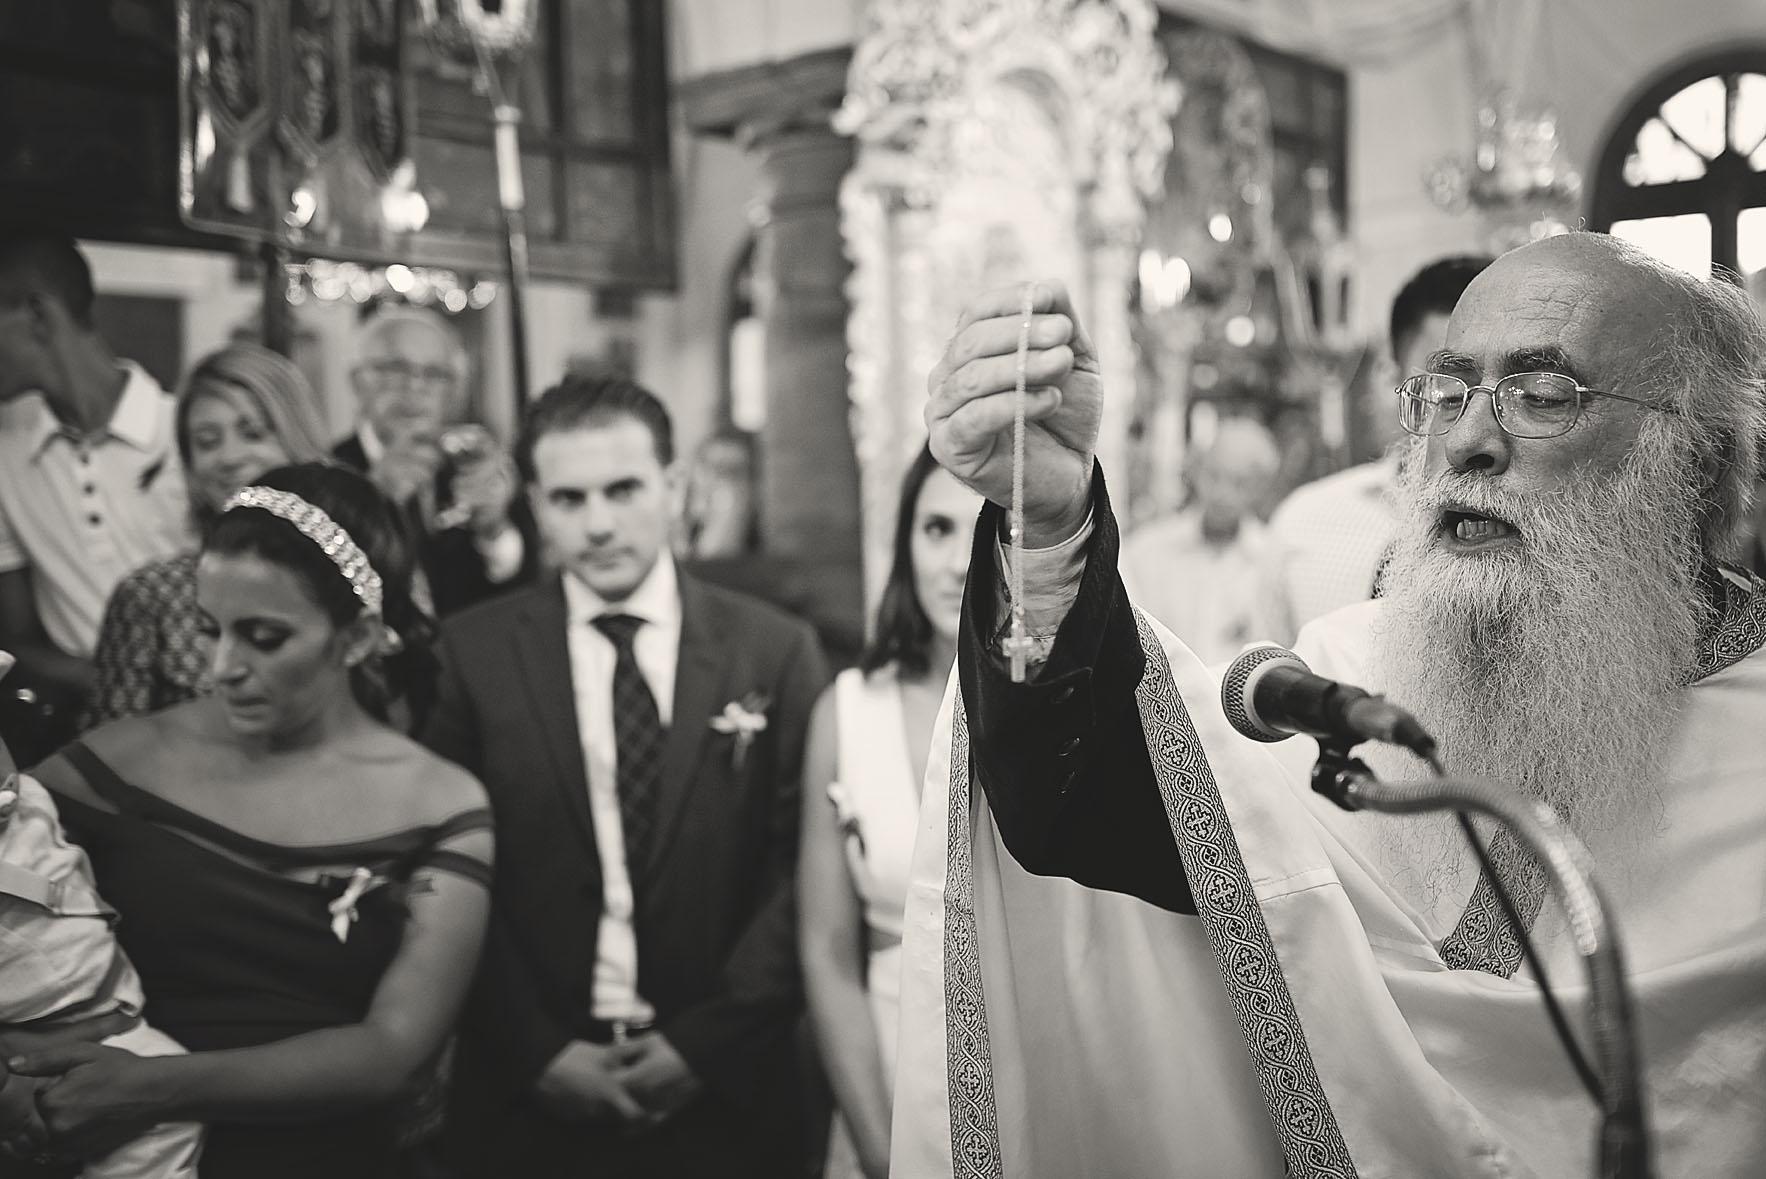 panagia-siriotissa-kampos-chios-christening-baptism-alexis-koumaditis-photography-10